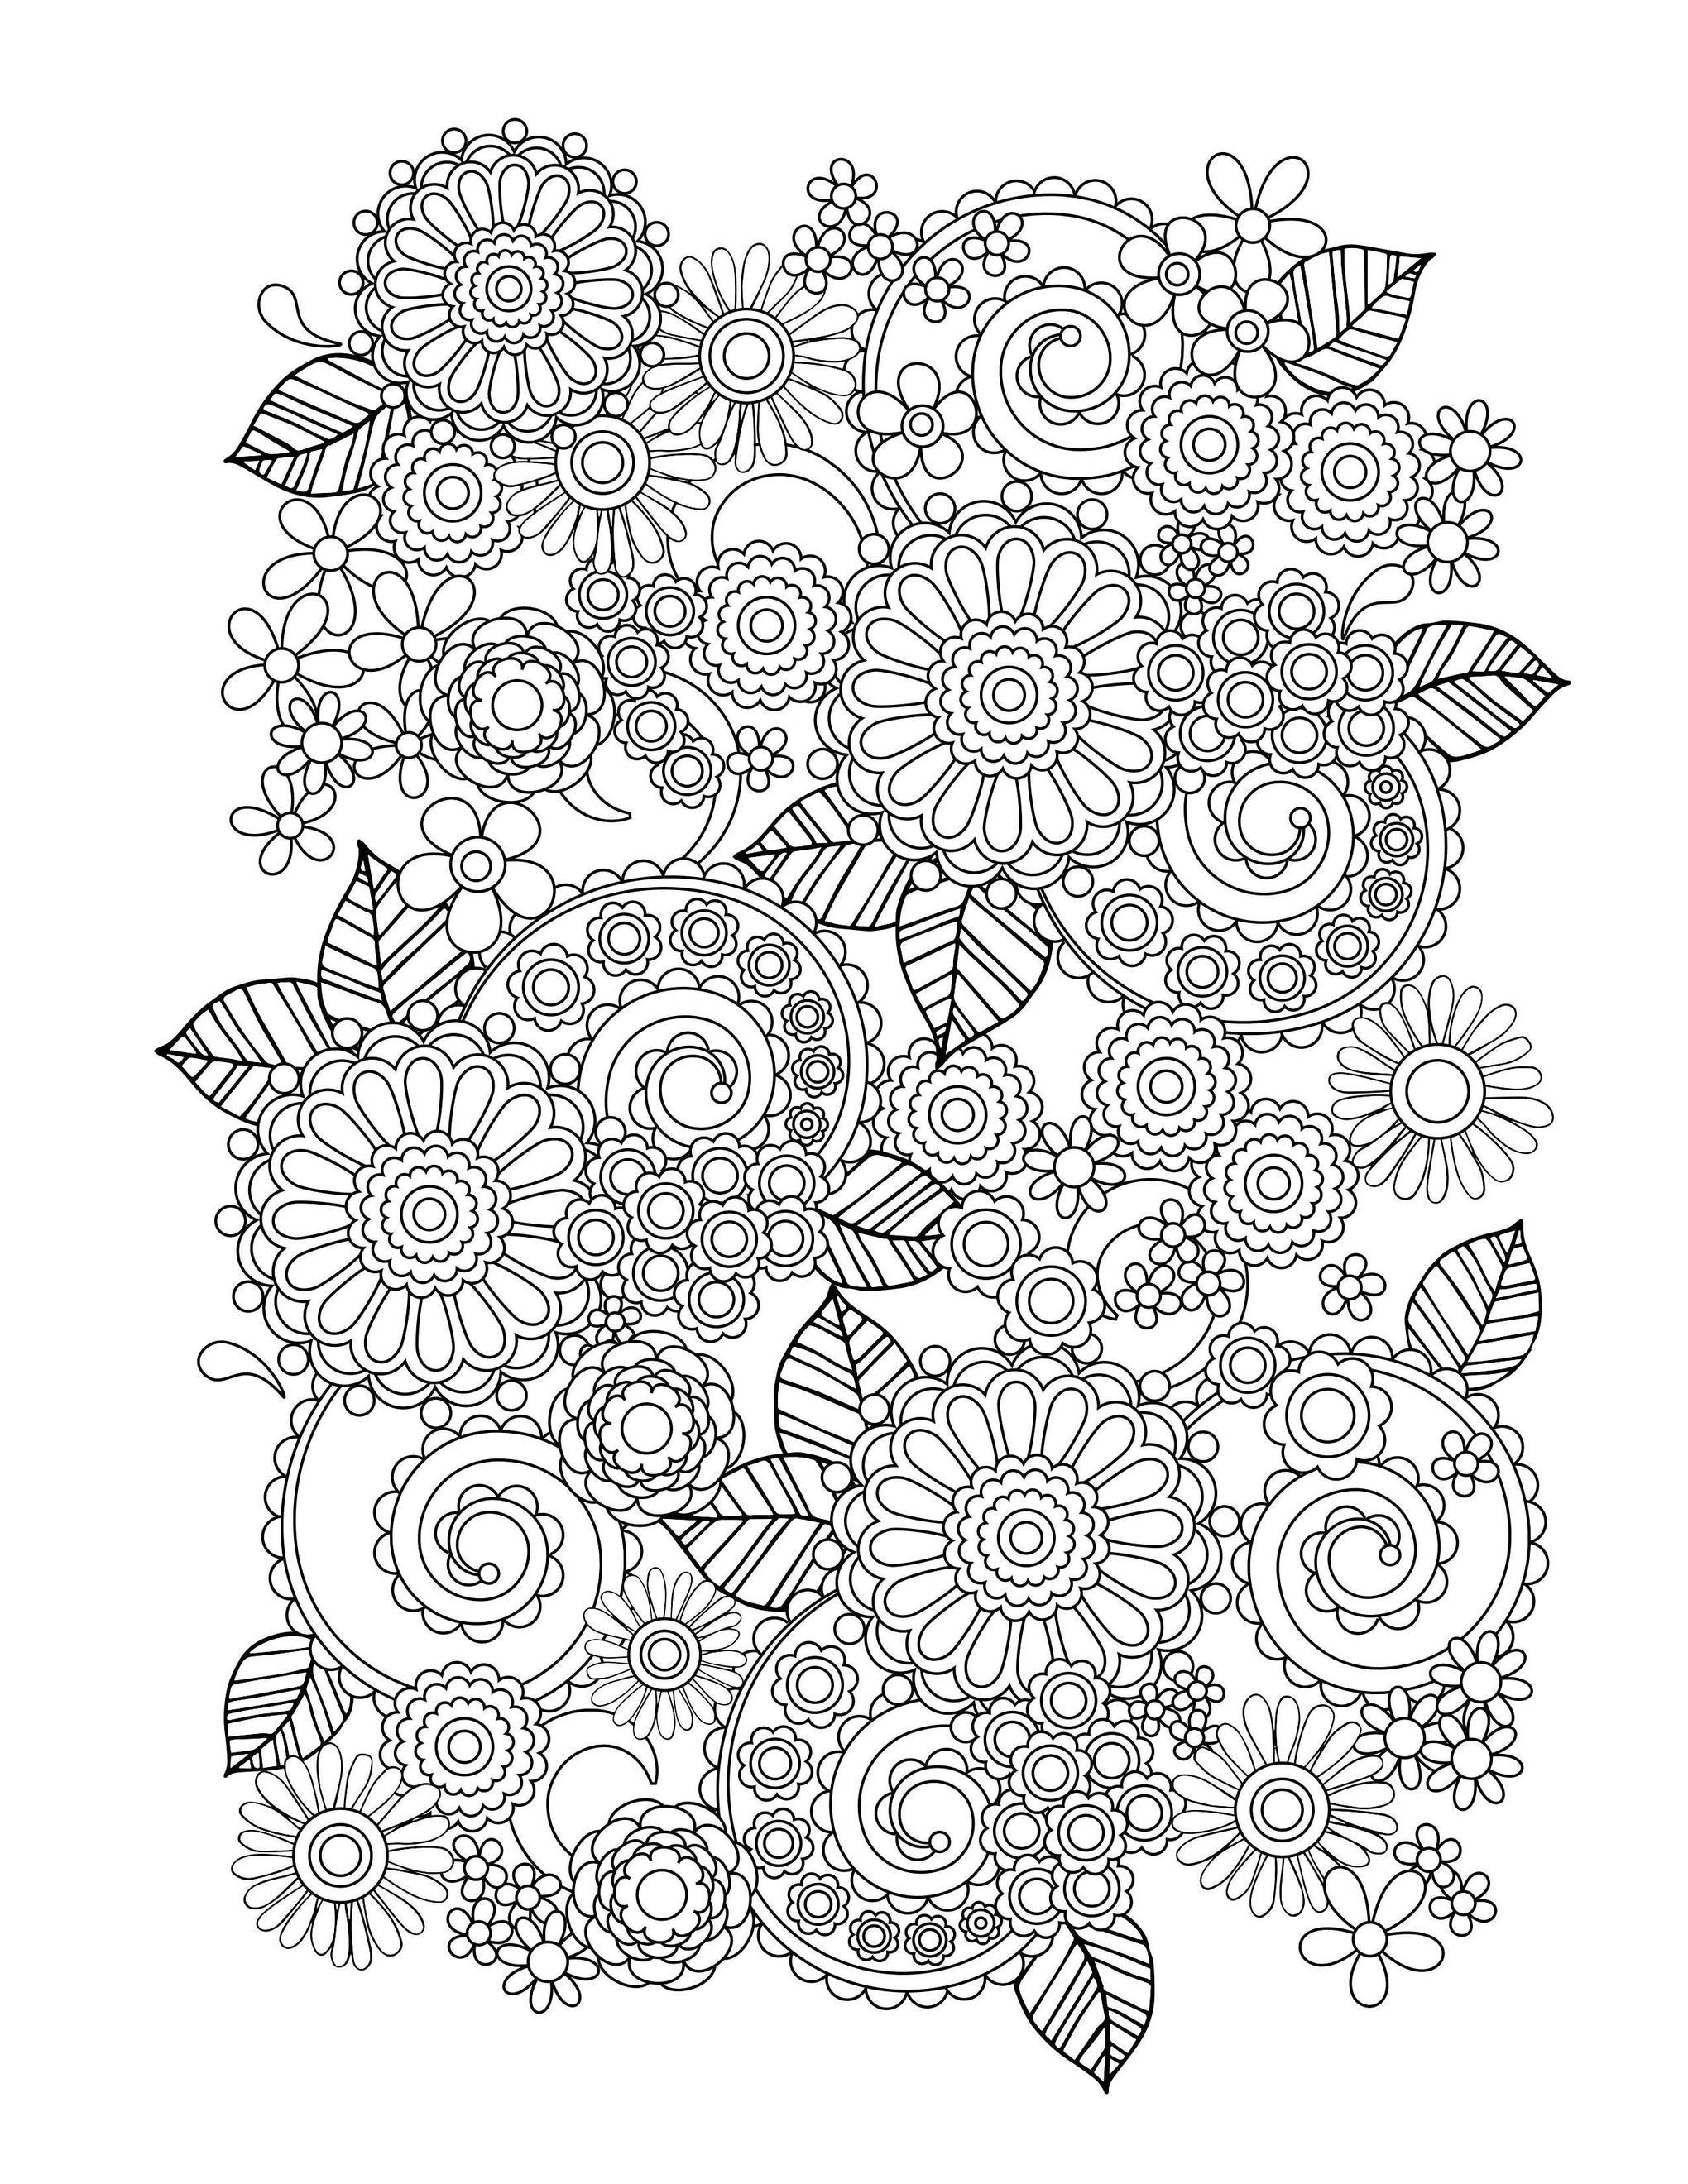 plex Flower Coloring Pages Coloring Home